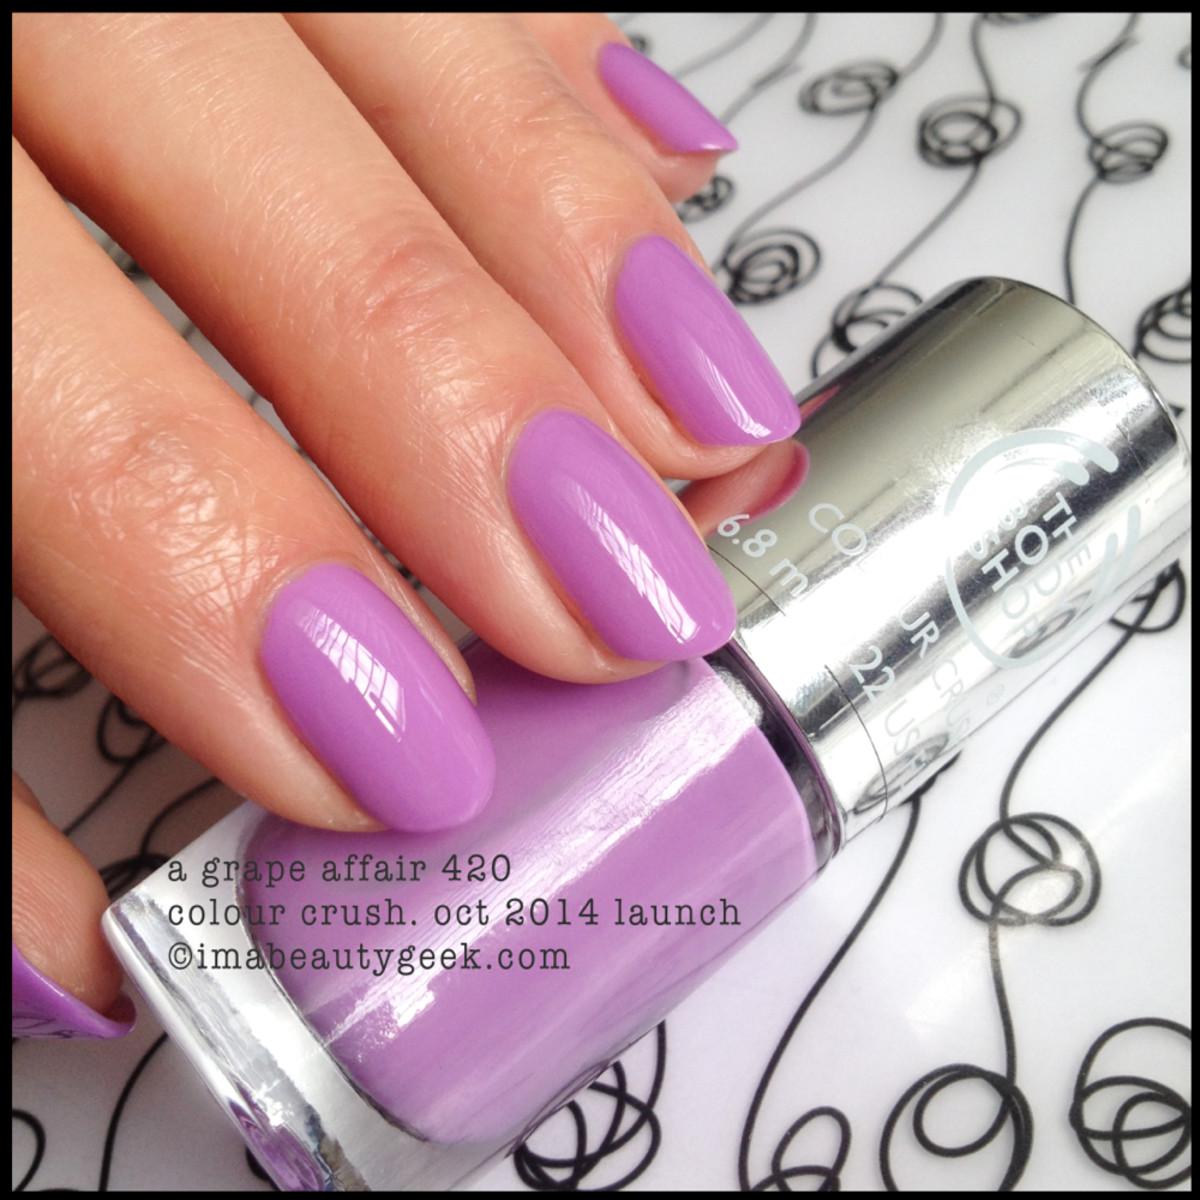 Body Shop A Grape Affair 420 Colour Crush Polish